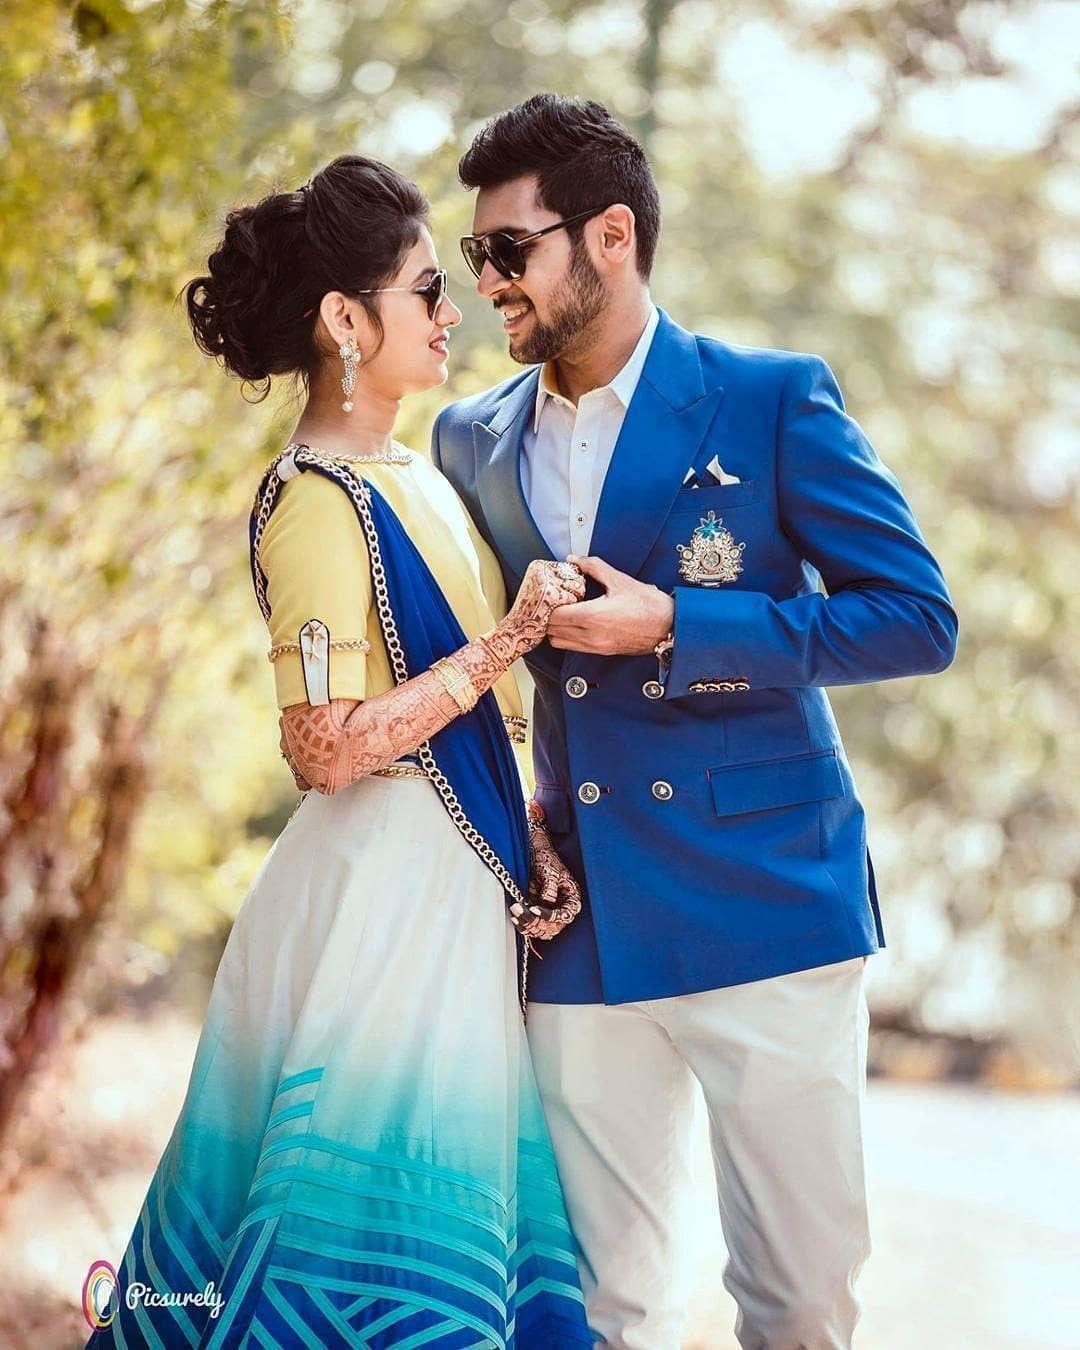 Photography Couple Prewedding Couplegoals Mumbai Ind In 2020 Indian Wedding Couple Photography Indian Wedding Photography Poses Indian Wedding Photography Couples